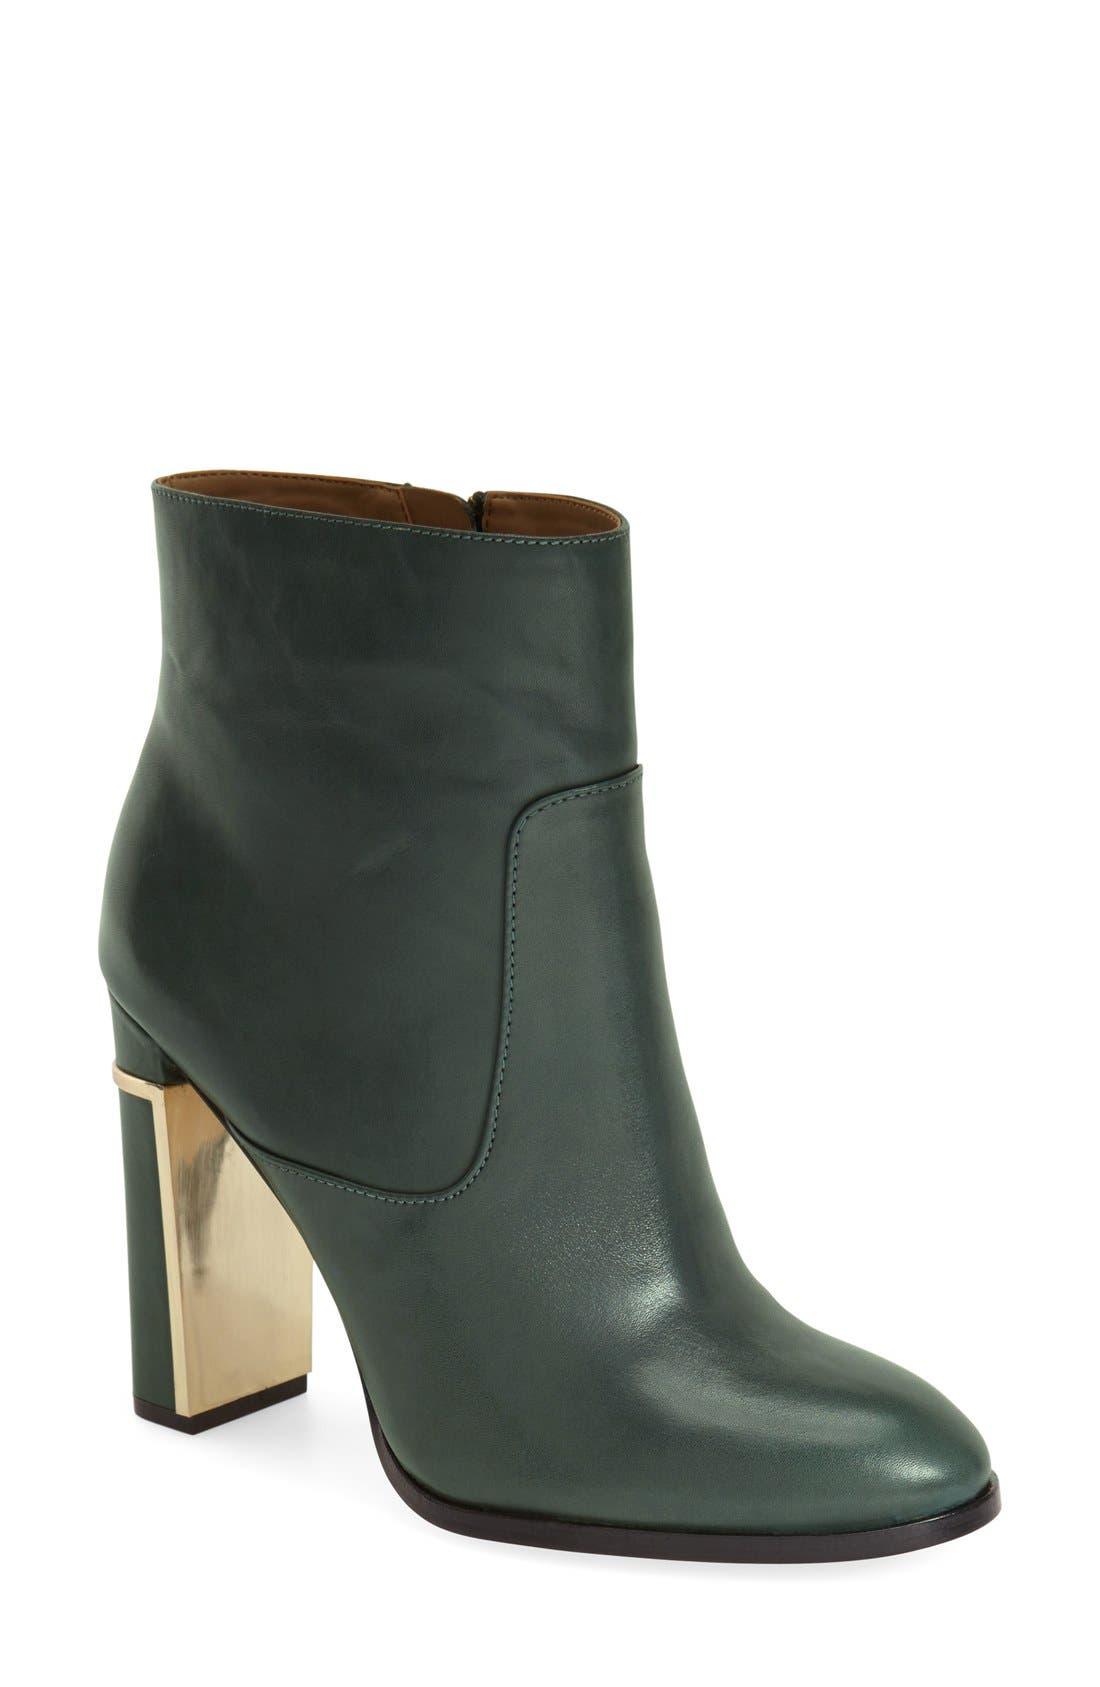 Alternate Image 1 Selected - Calvin Klein 'Karlia' Ankle Bootie(Women)